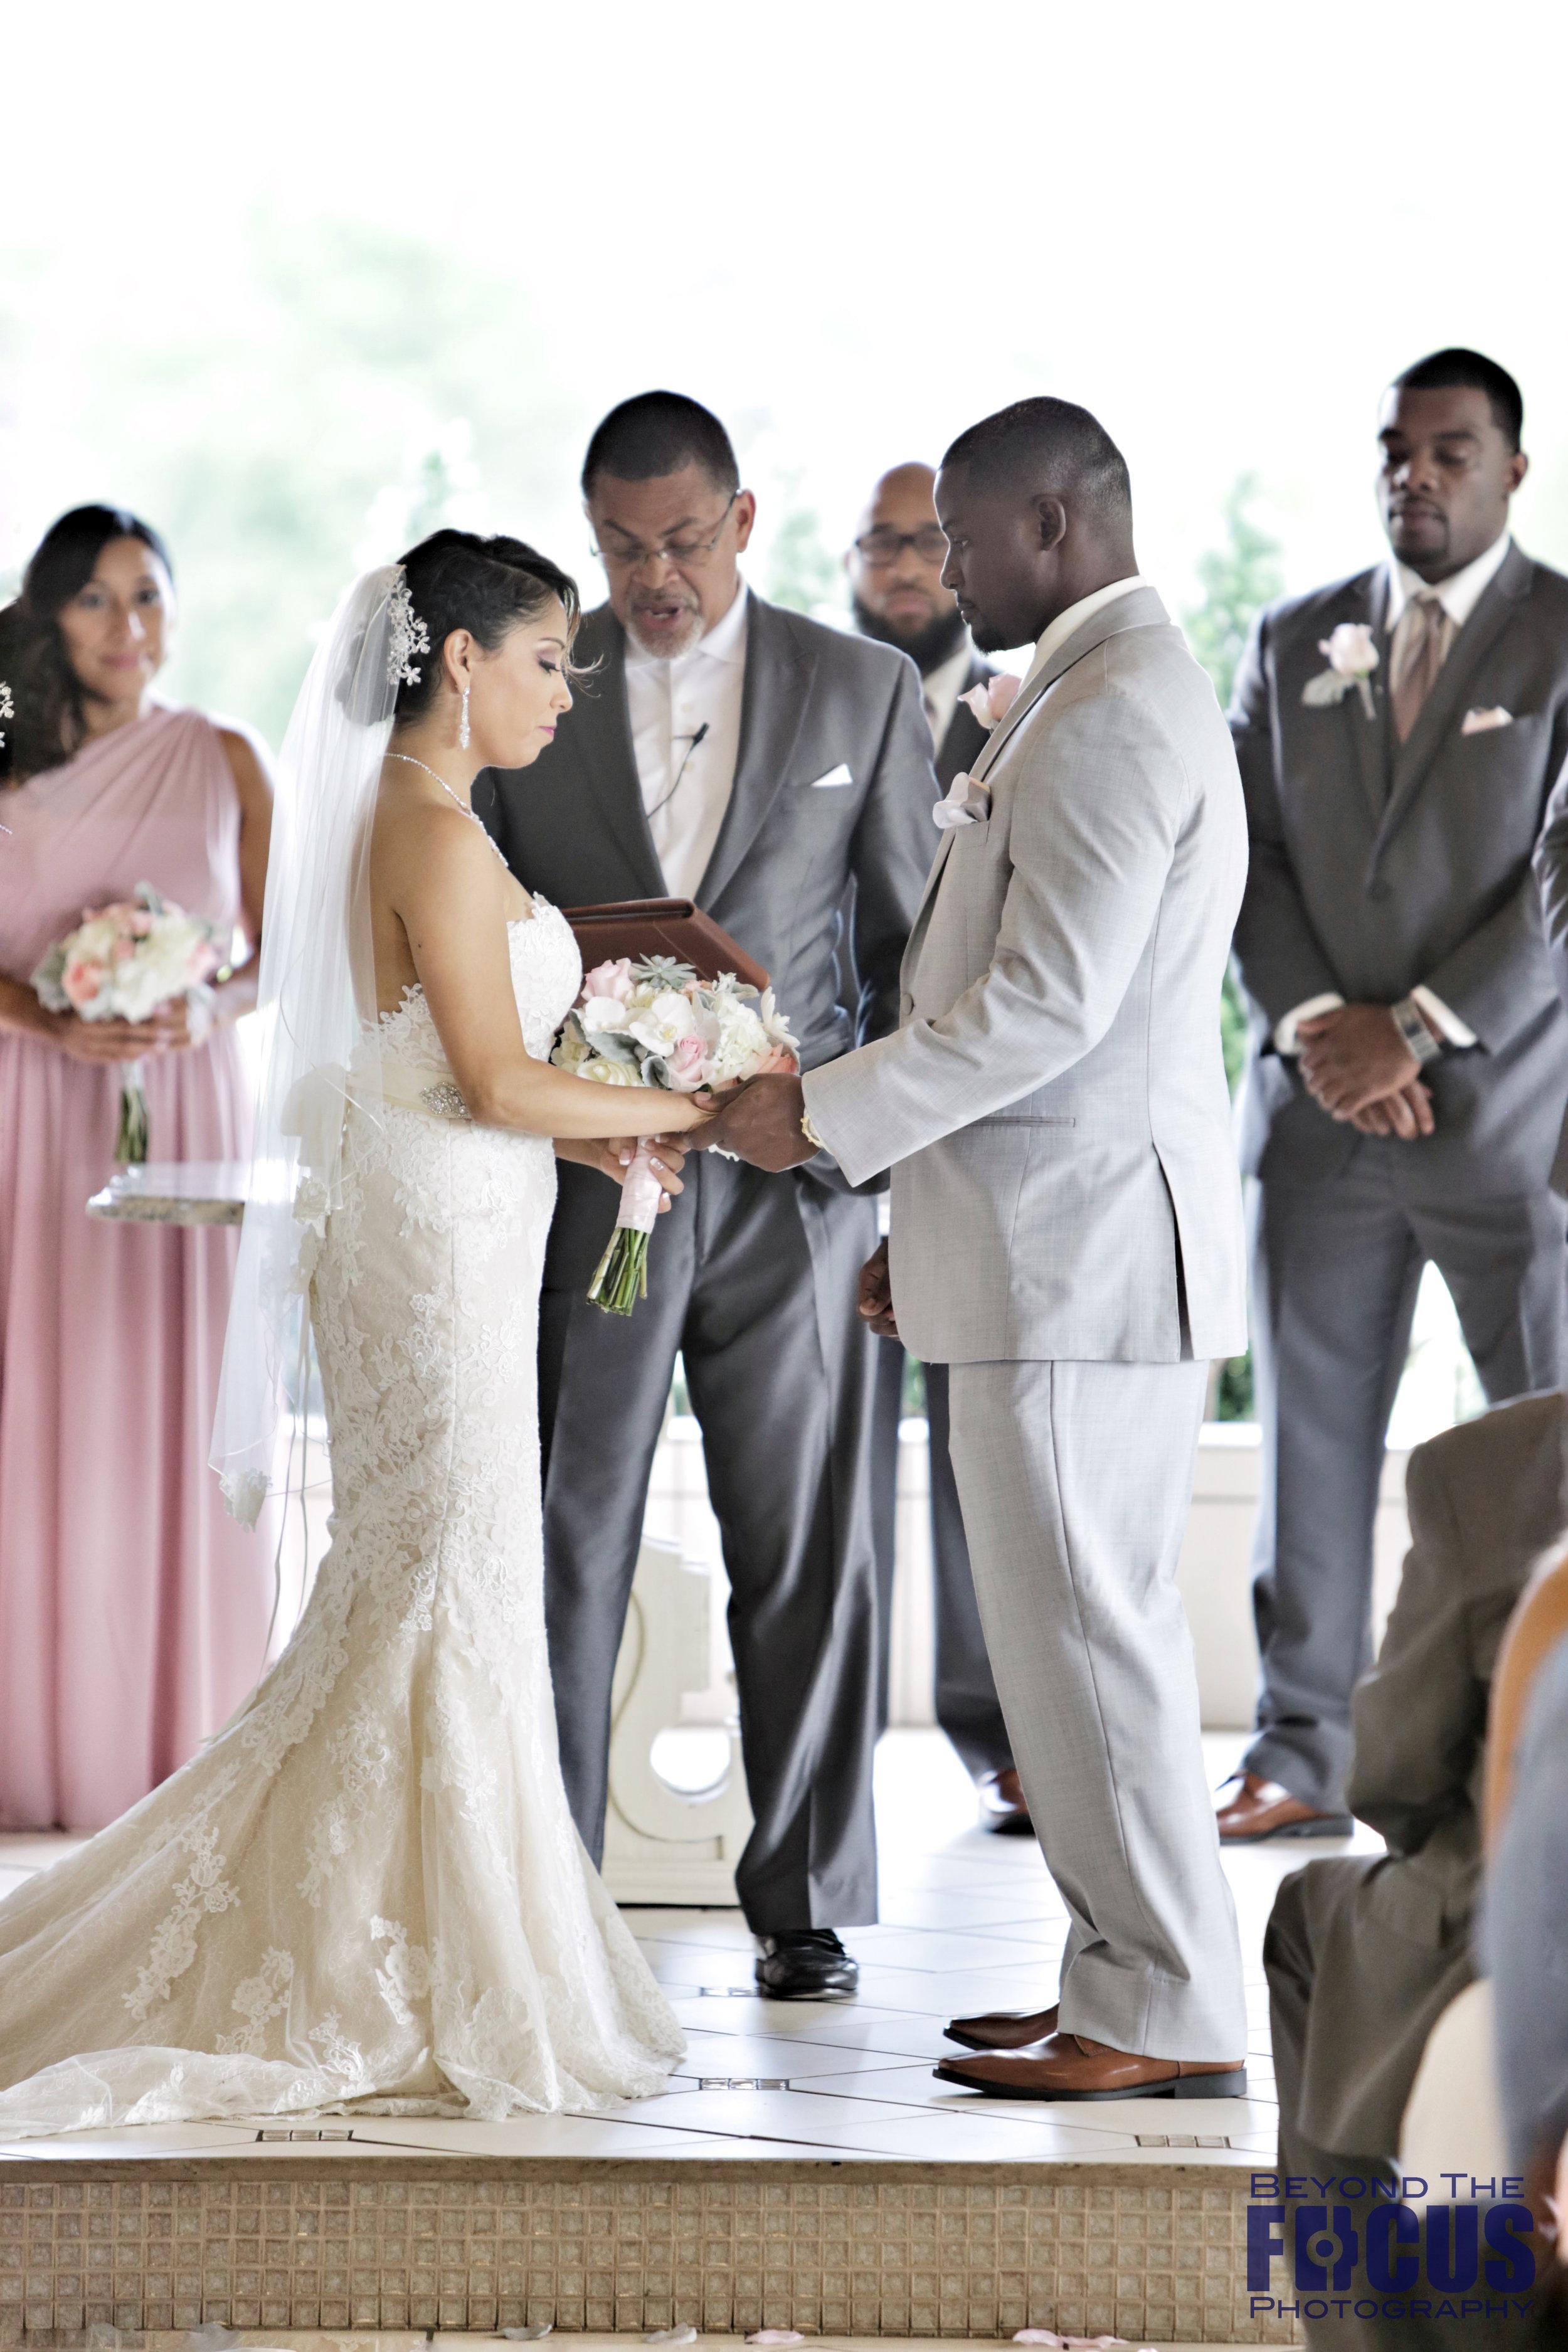 Palmer Wedding - Wedding Ceremony46.jpg